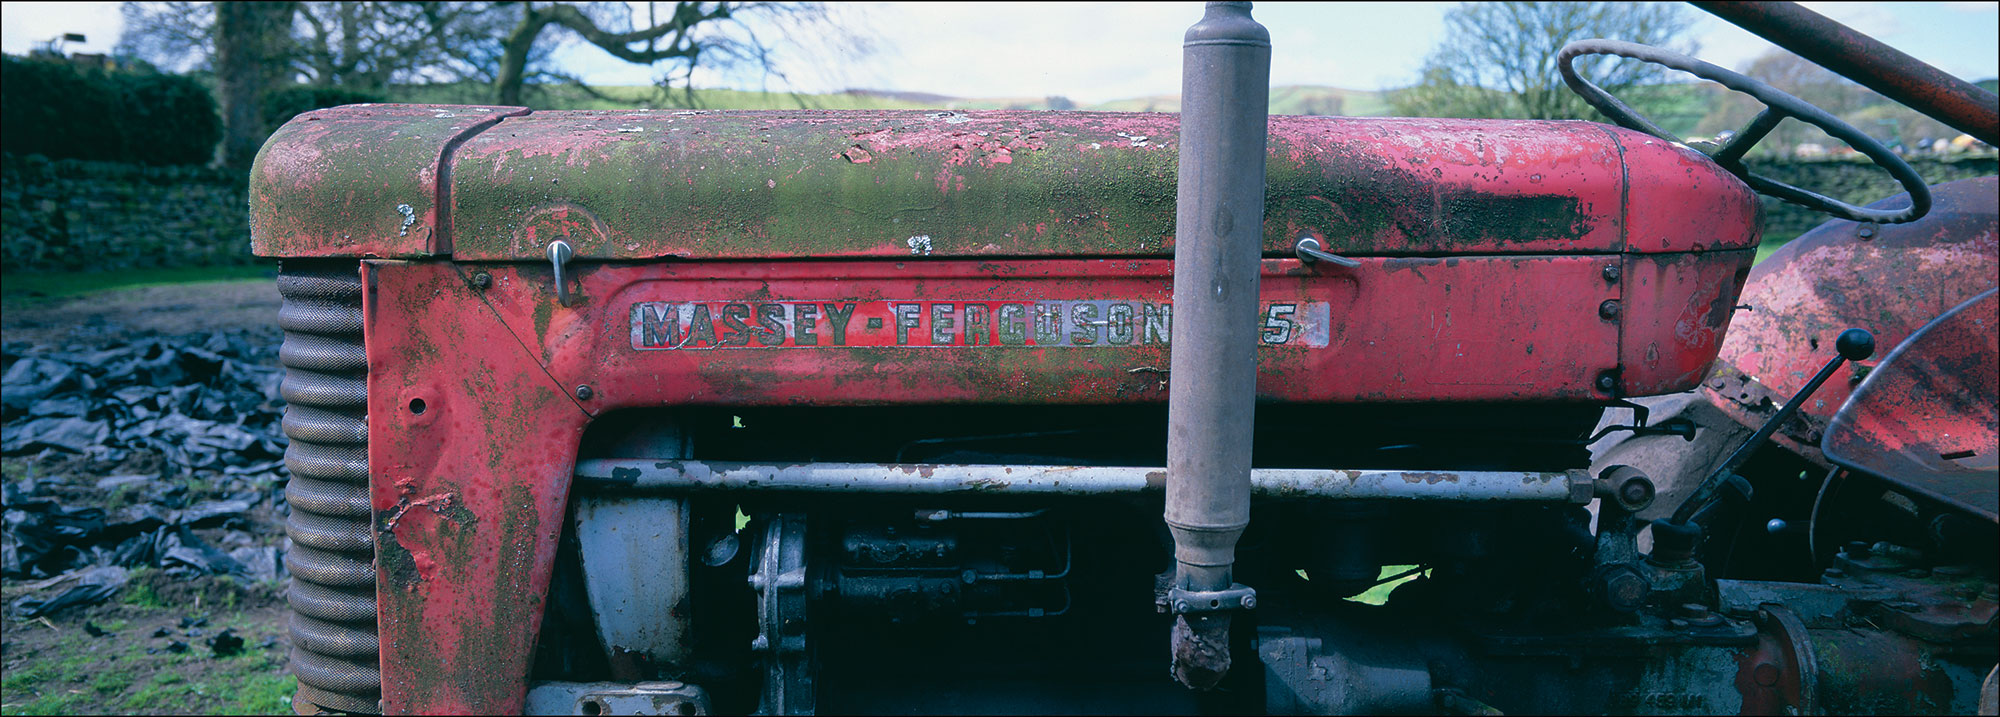 com-massey-ferguson_Tractor